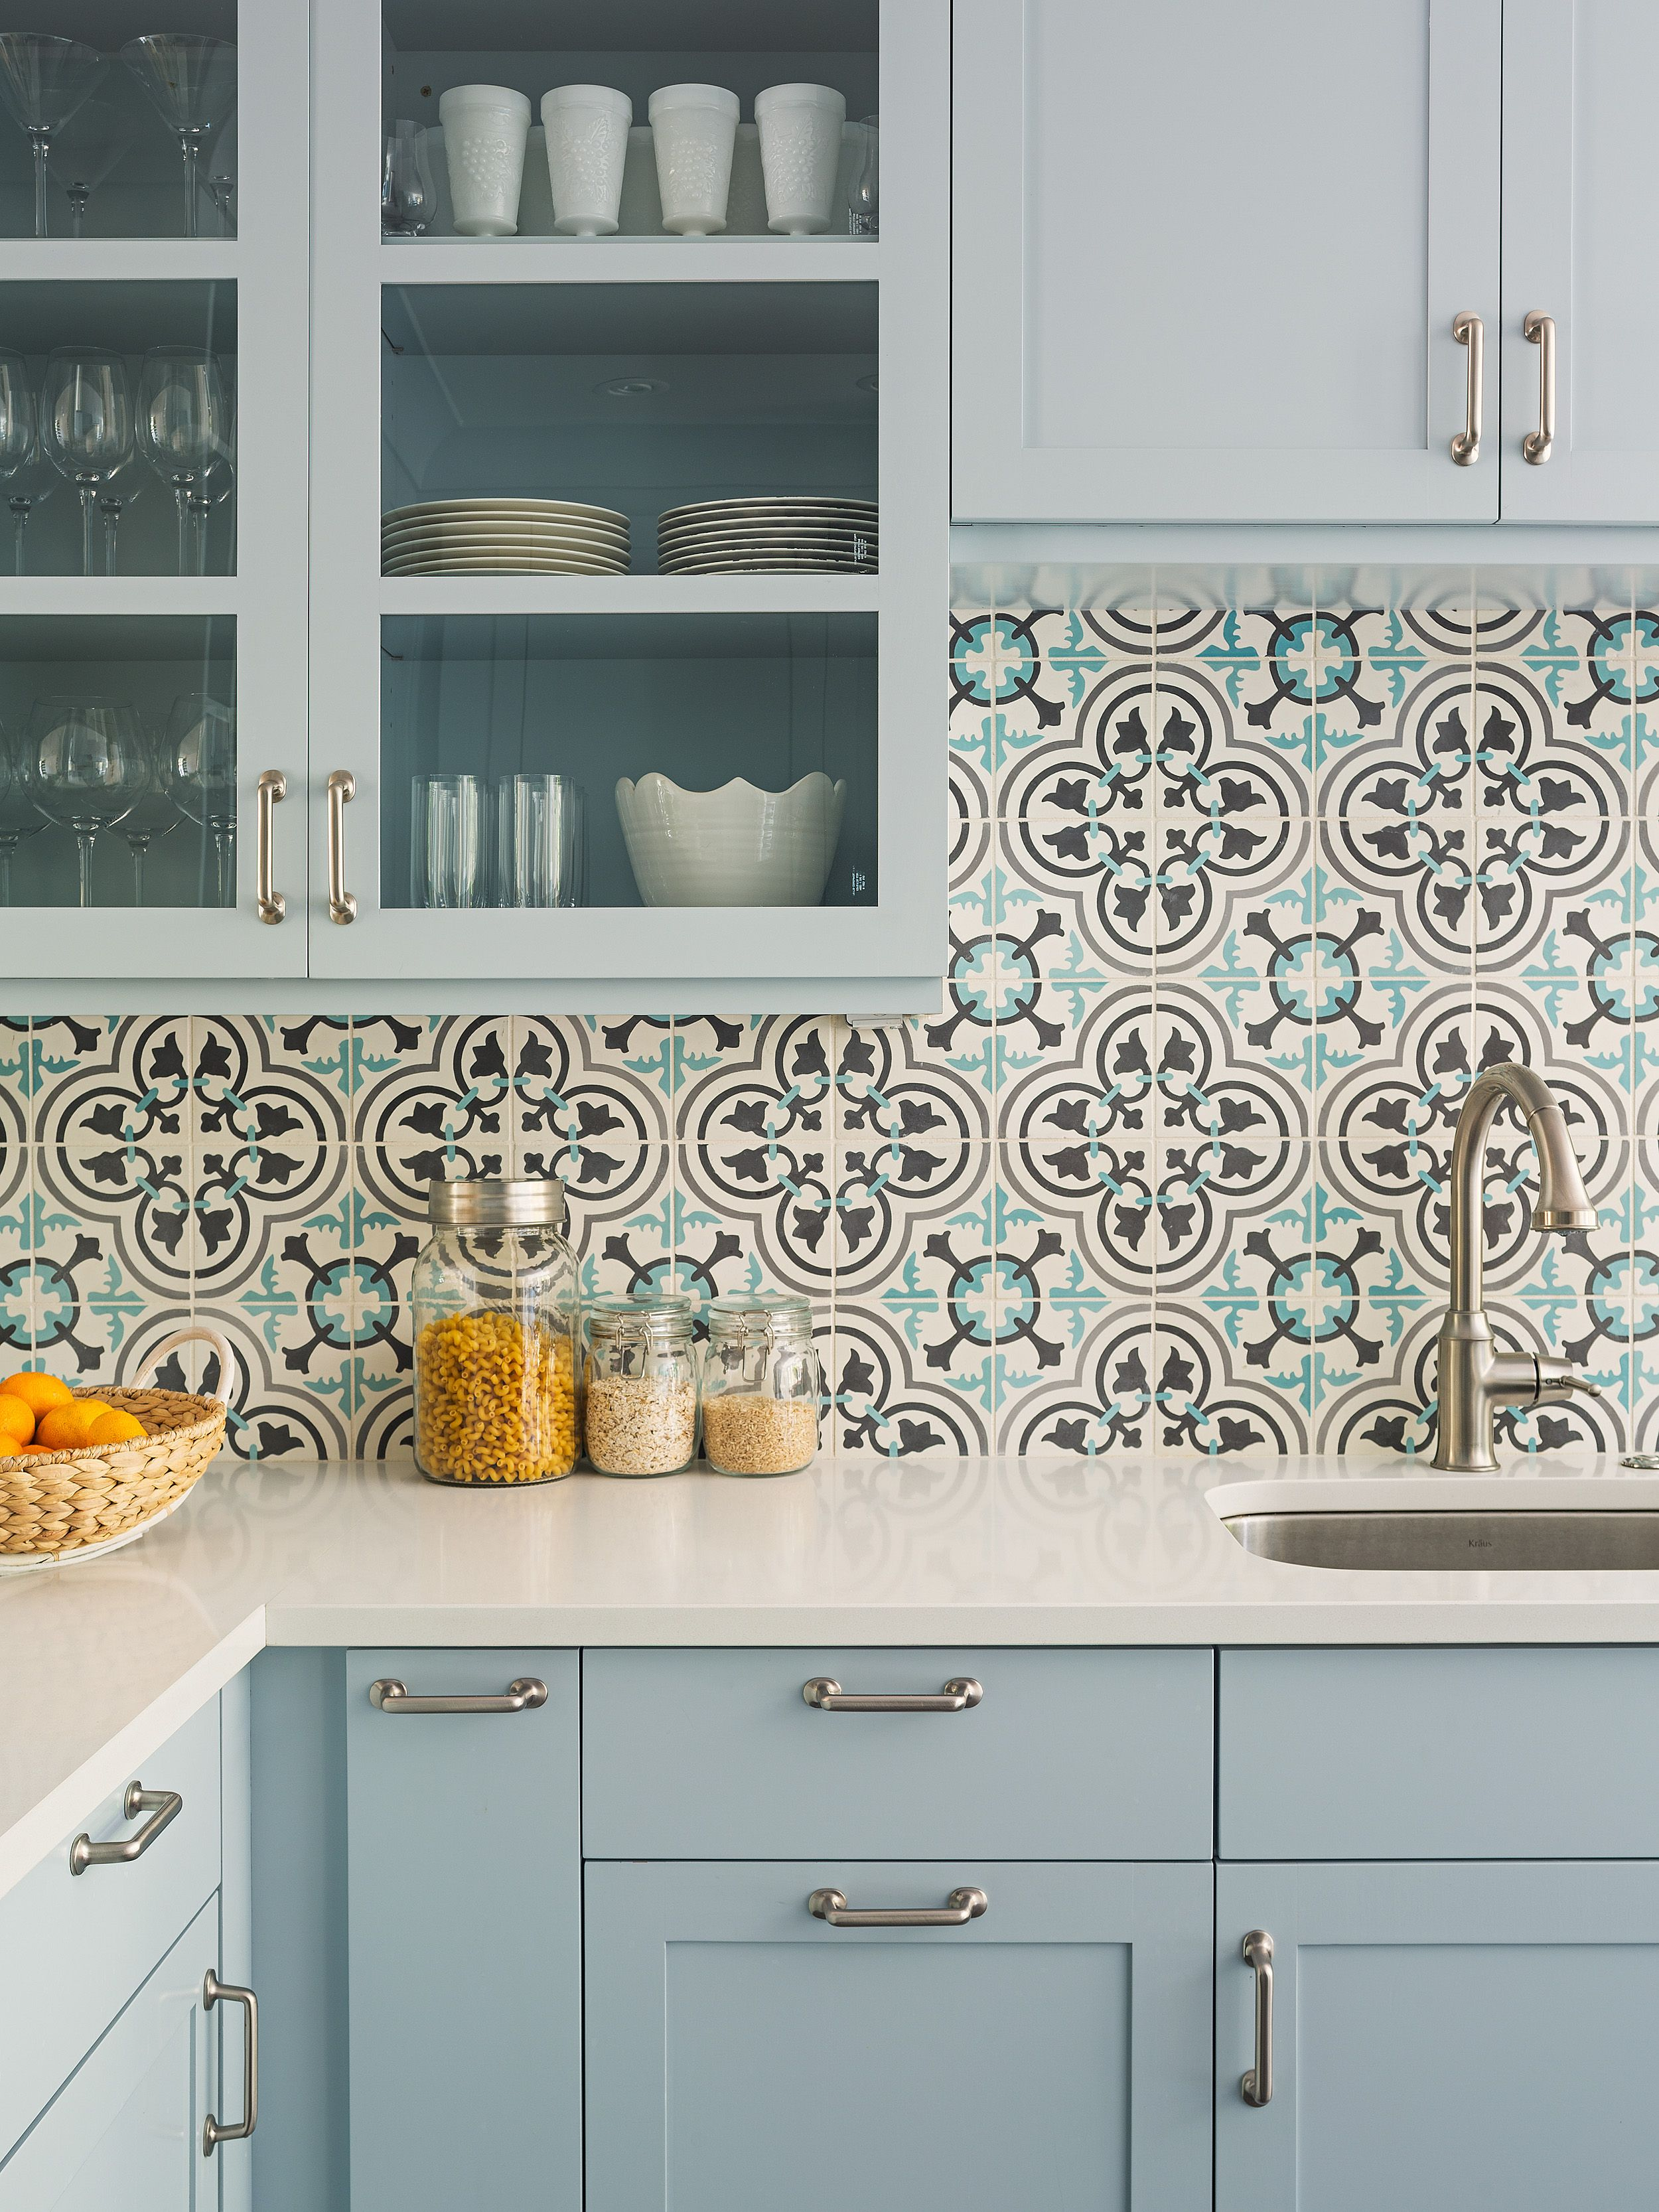 The Everlasting Elegance of Granada Tile Kitchen wall